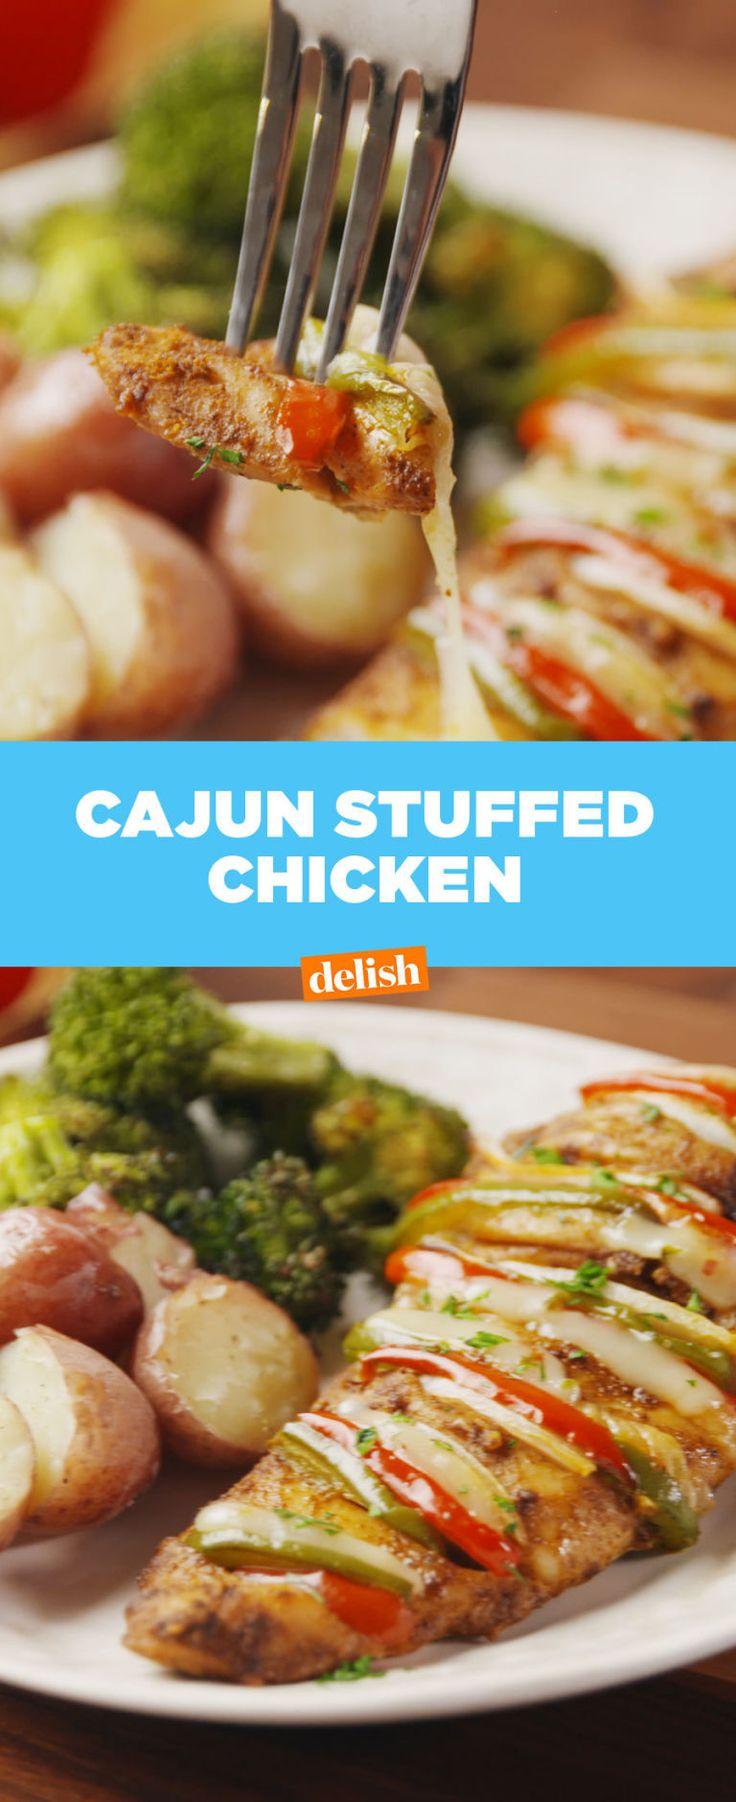 Cajun Stuffed Chicken